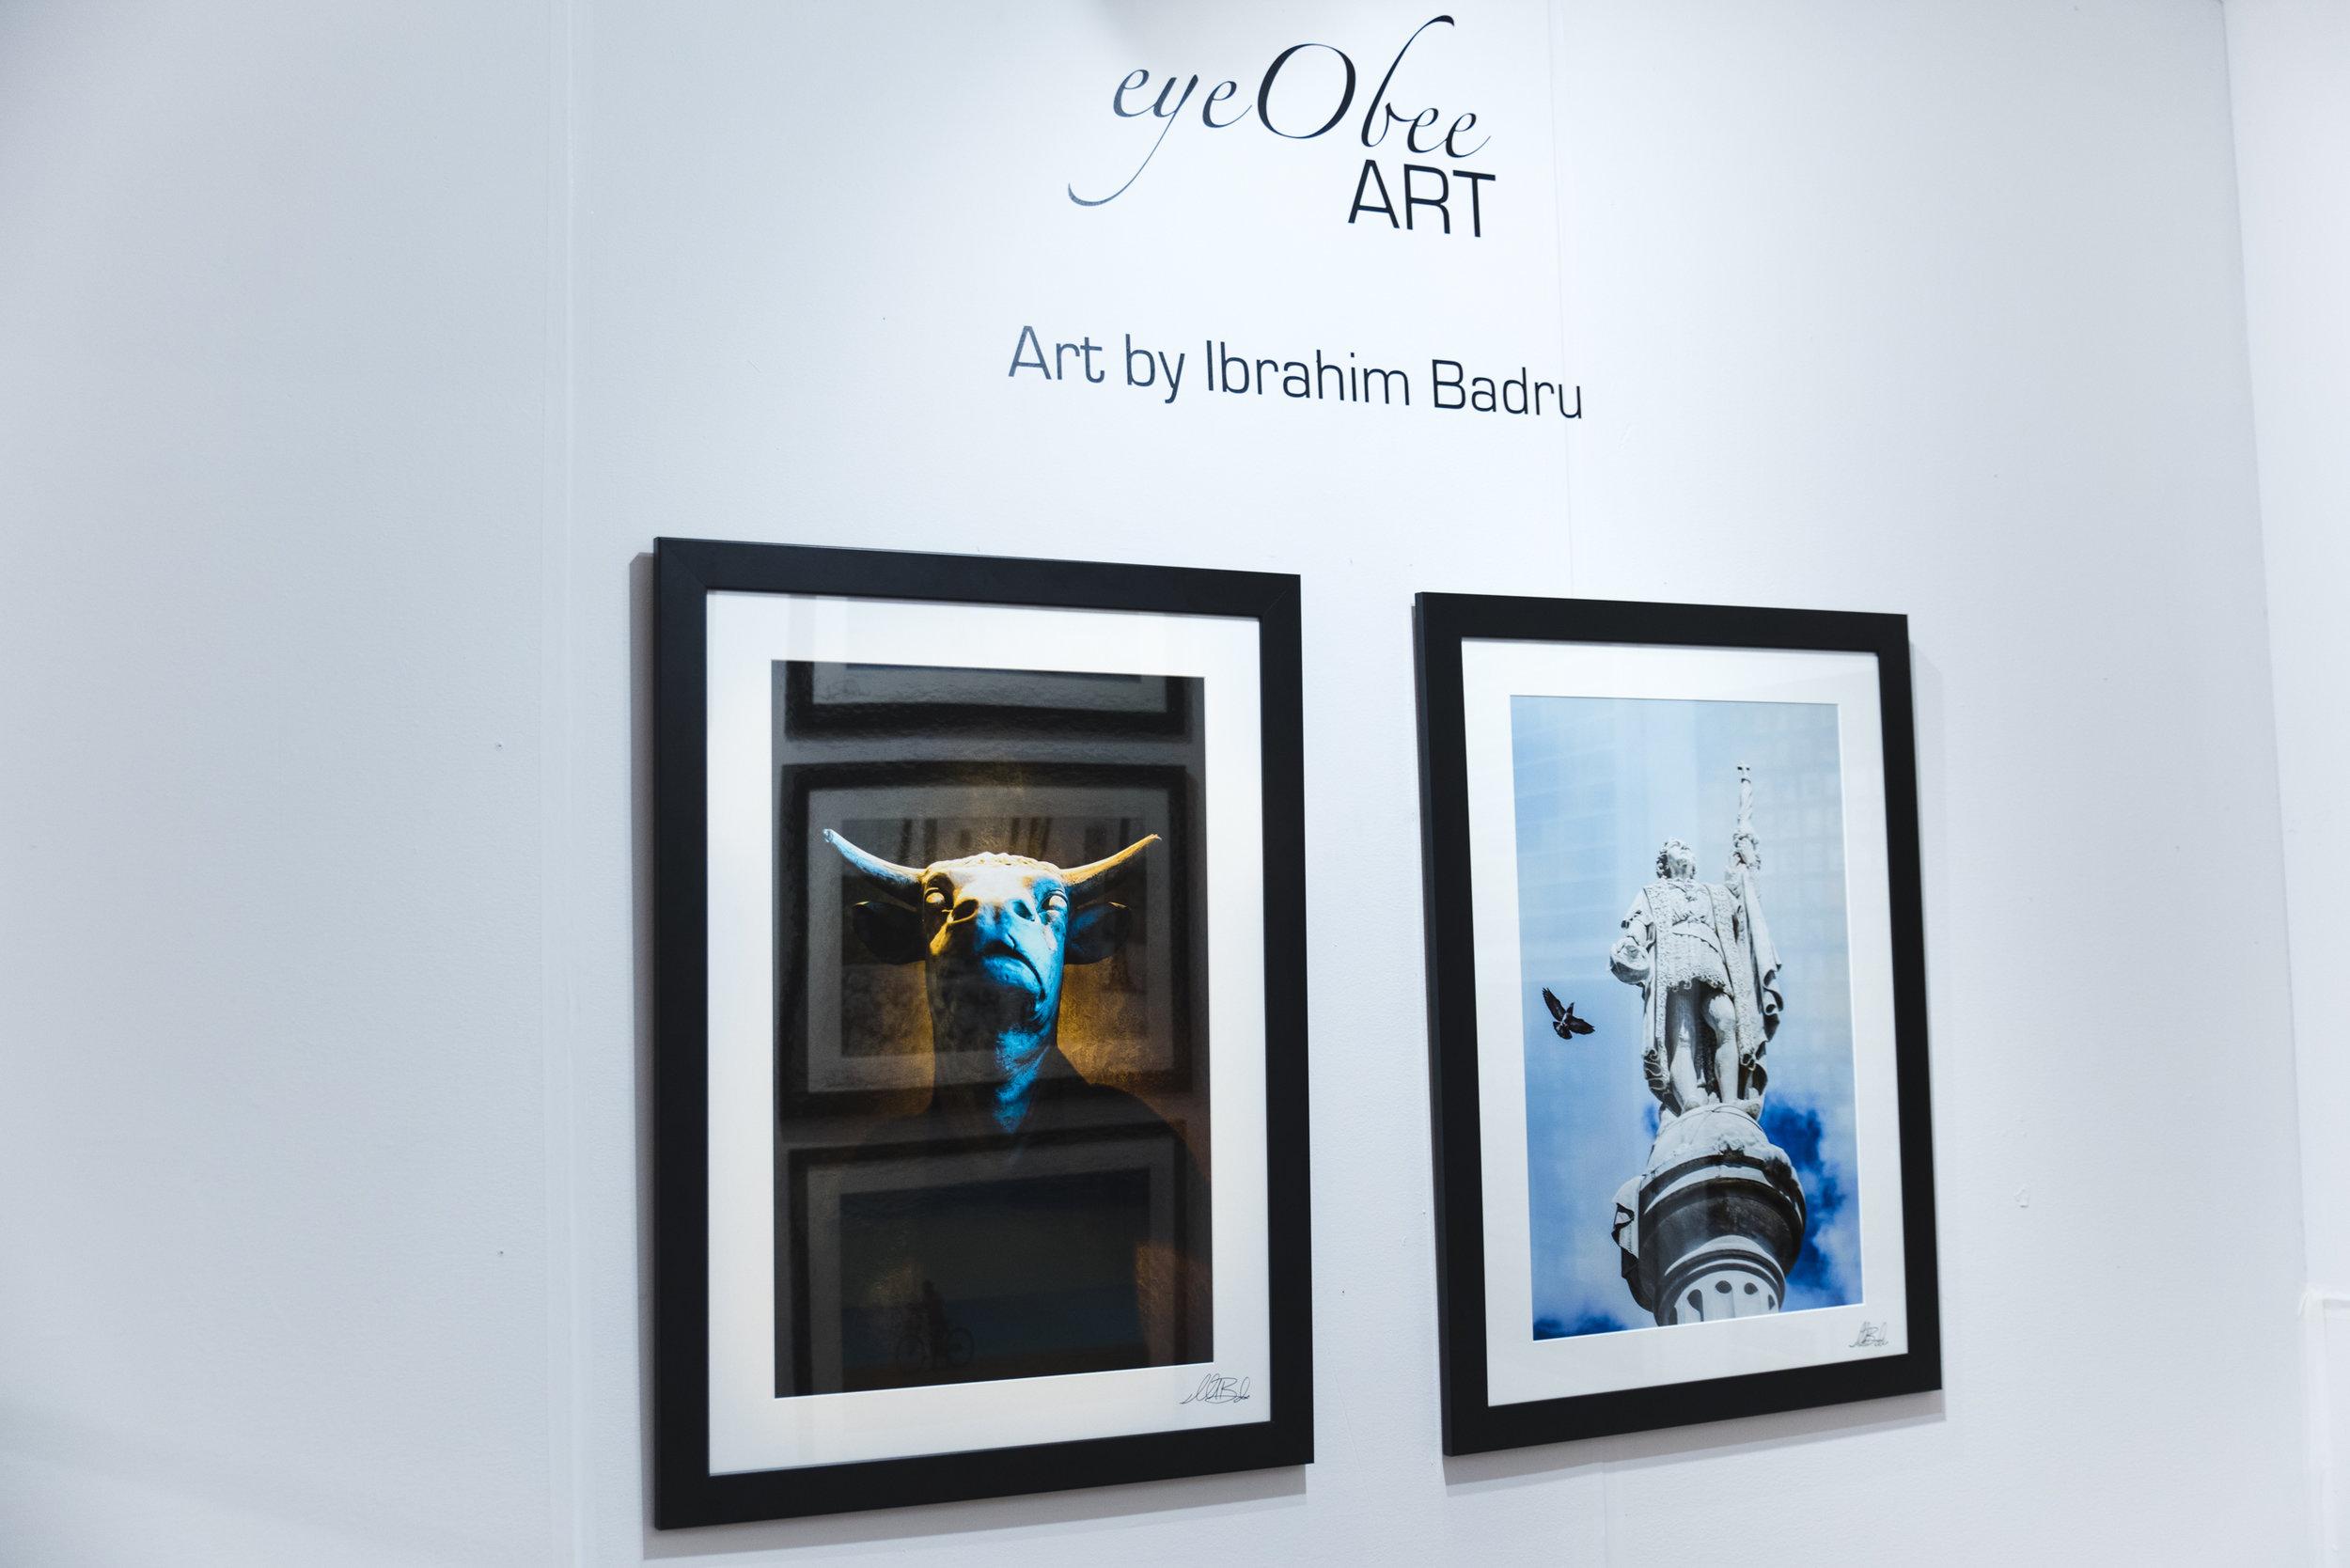 Spectrum Miami Art Basel eyeObee Art by Ibrahim Badru Photo solo-9.jpg